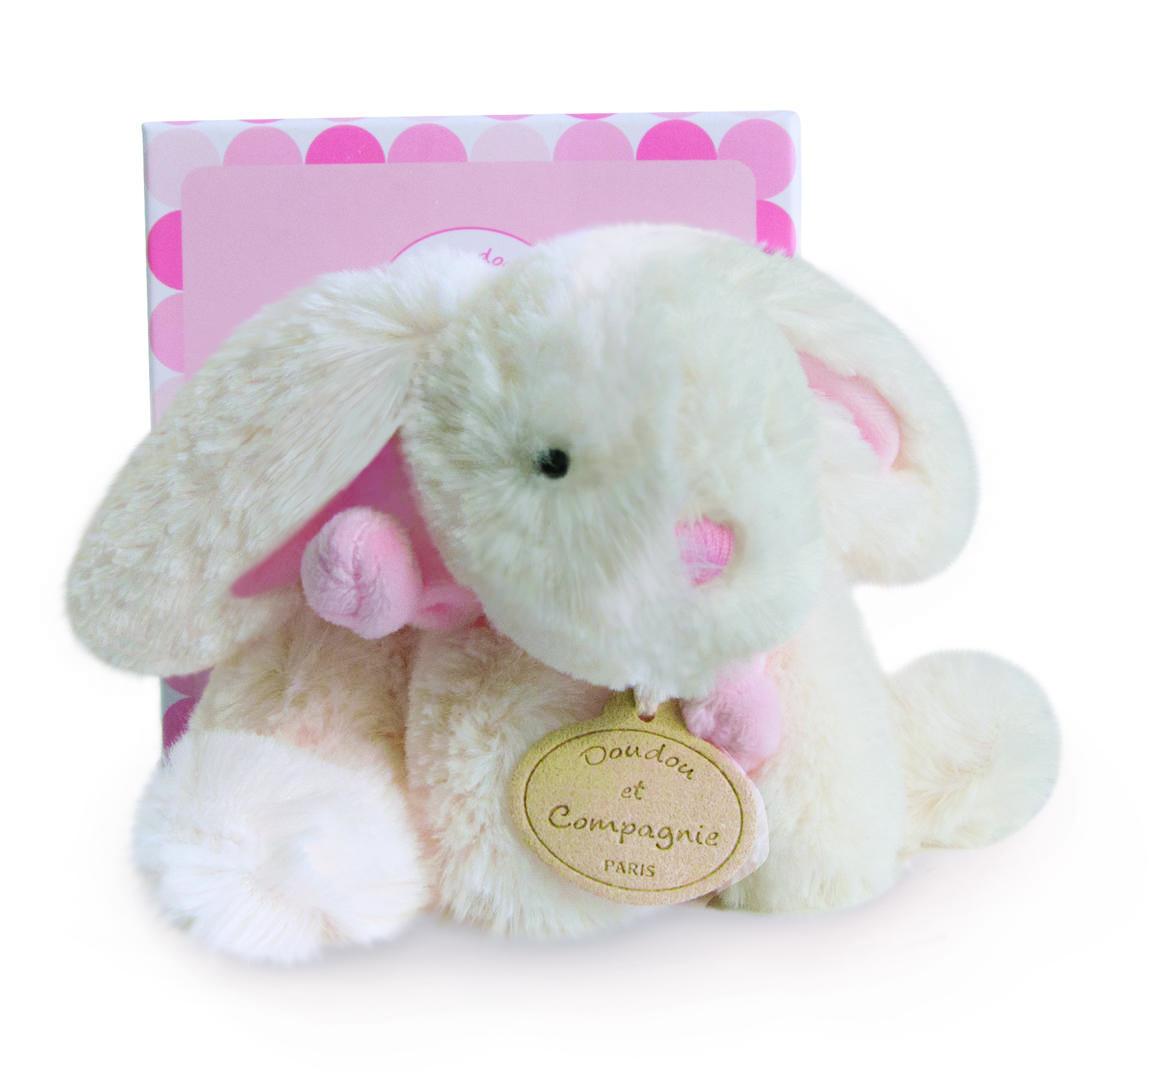 large pink rabbit 30cm + gift box   Trada Marketplace